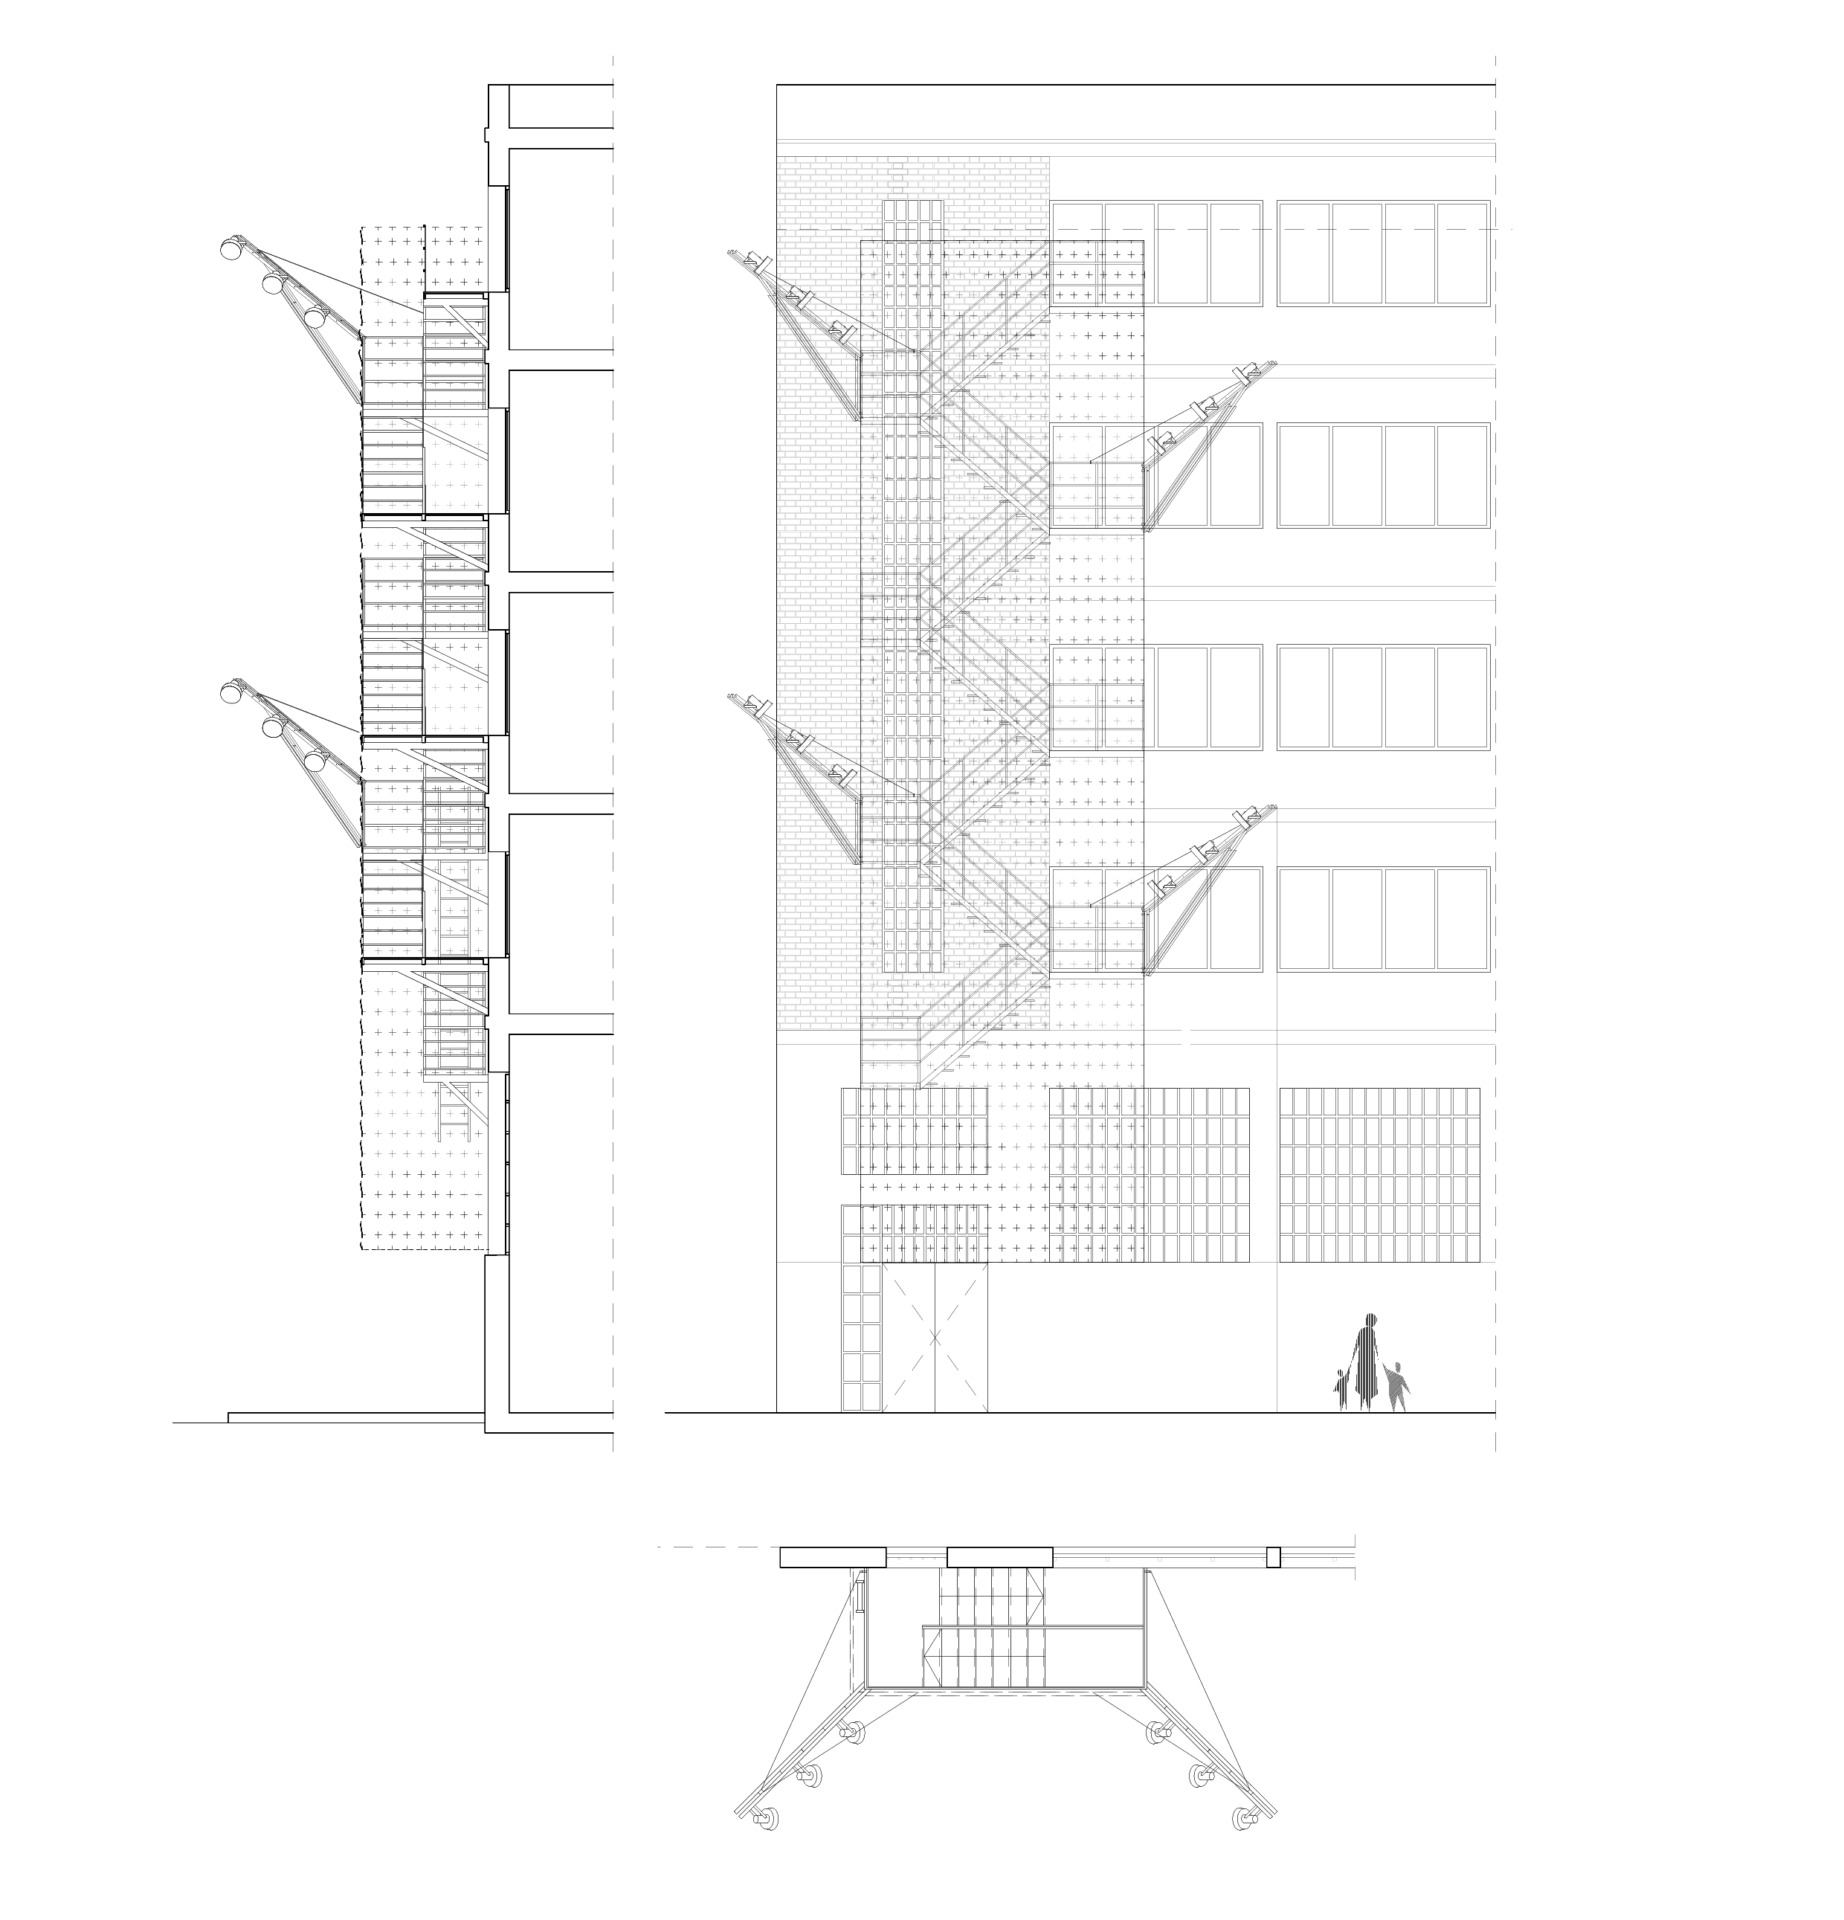 Sala Ferusic Architects Vibe Cast Carles Sala Relja Ferusic